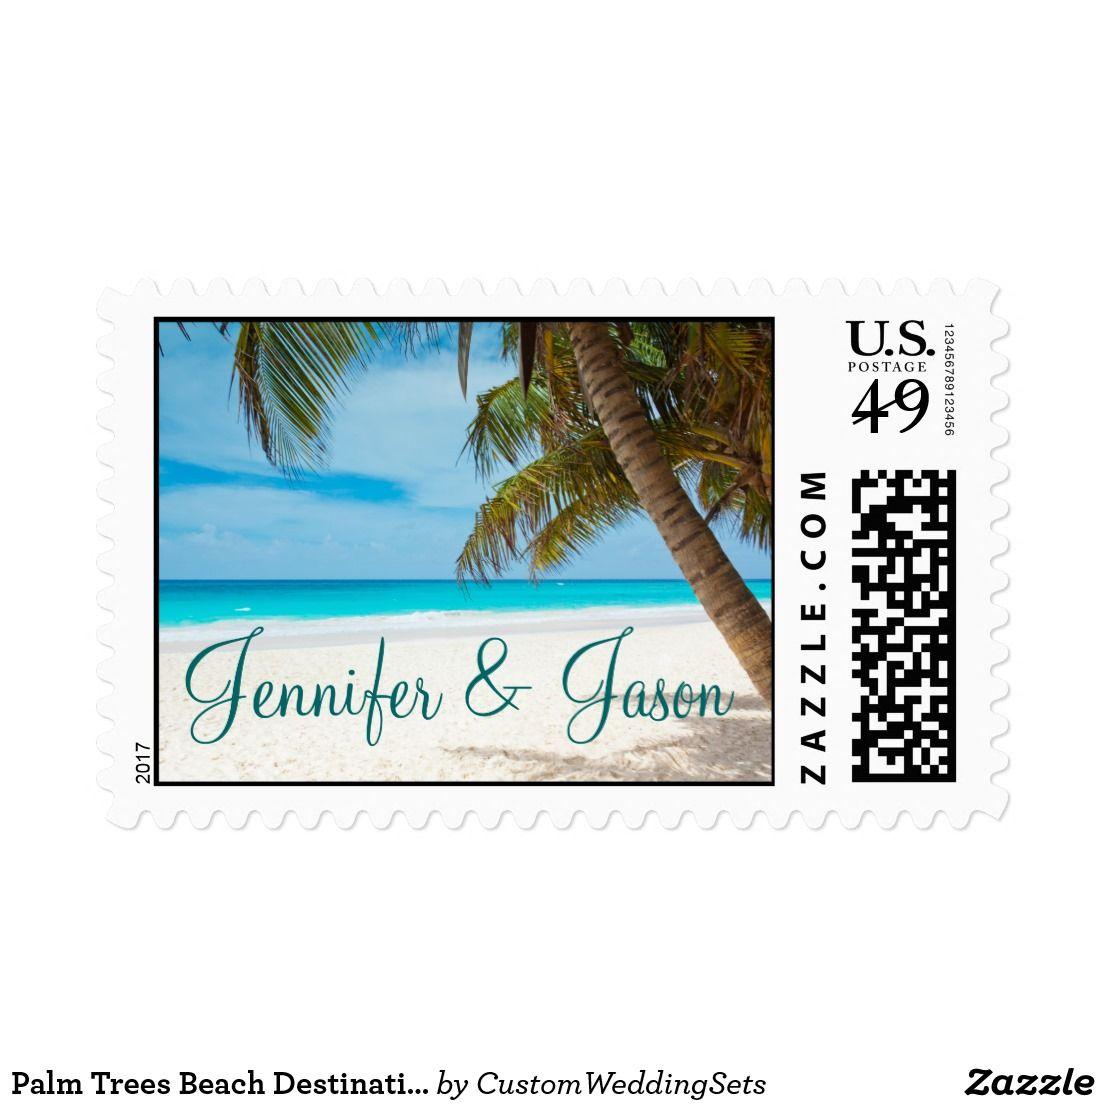 Palm Trees Beach Destination Wedding Postage Stamp   Palms, Trees ...